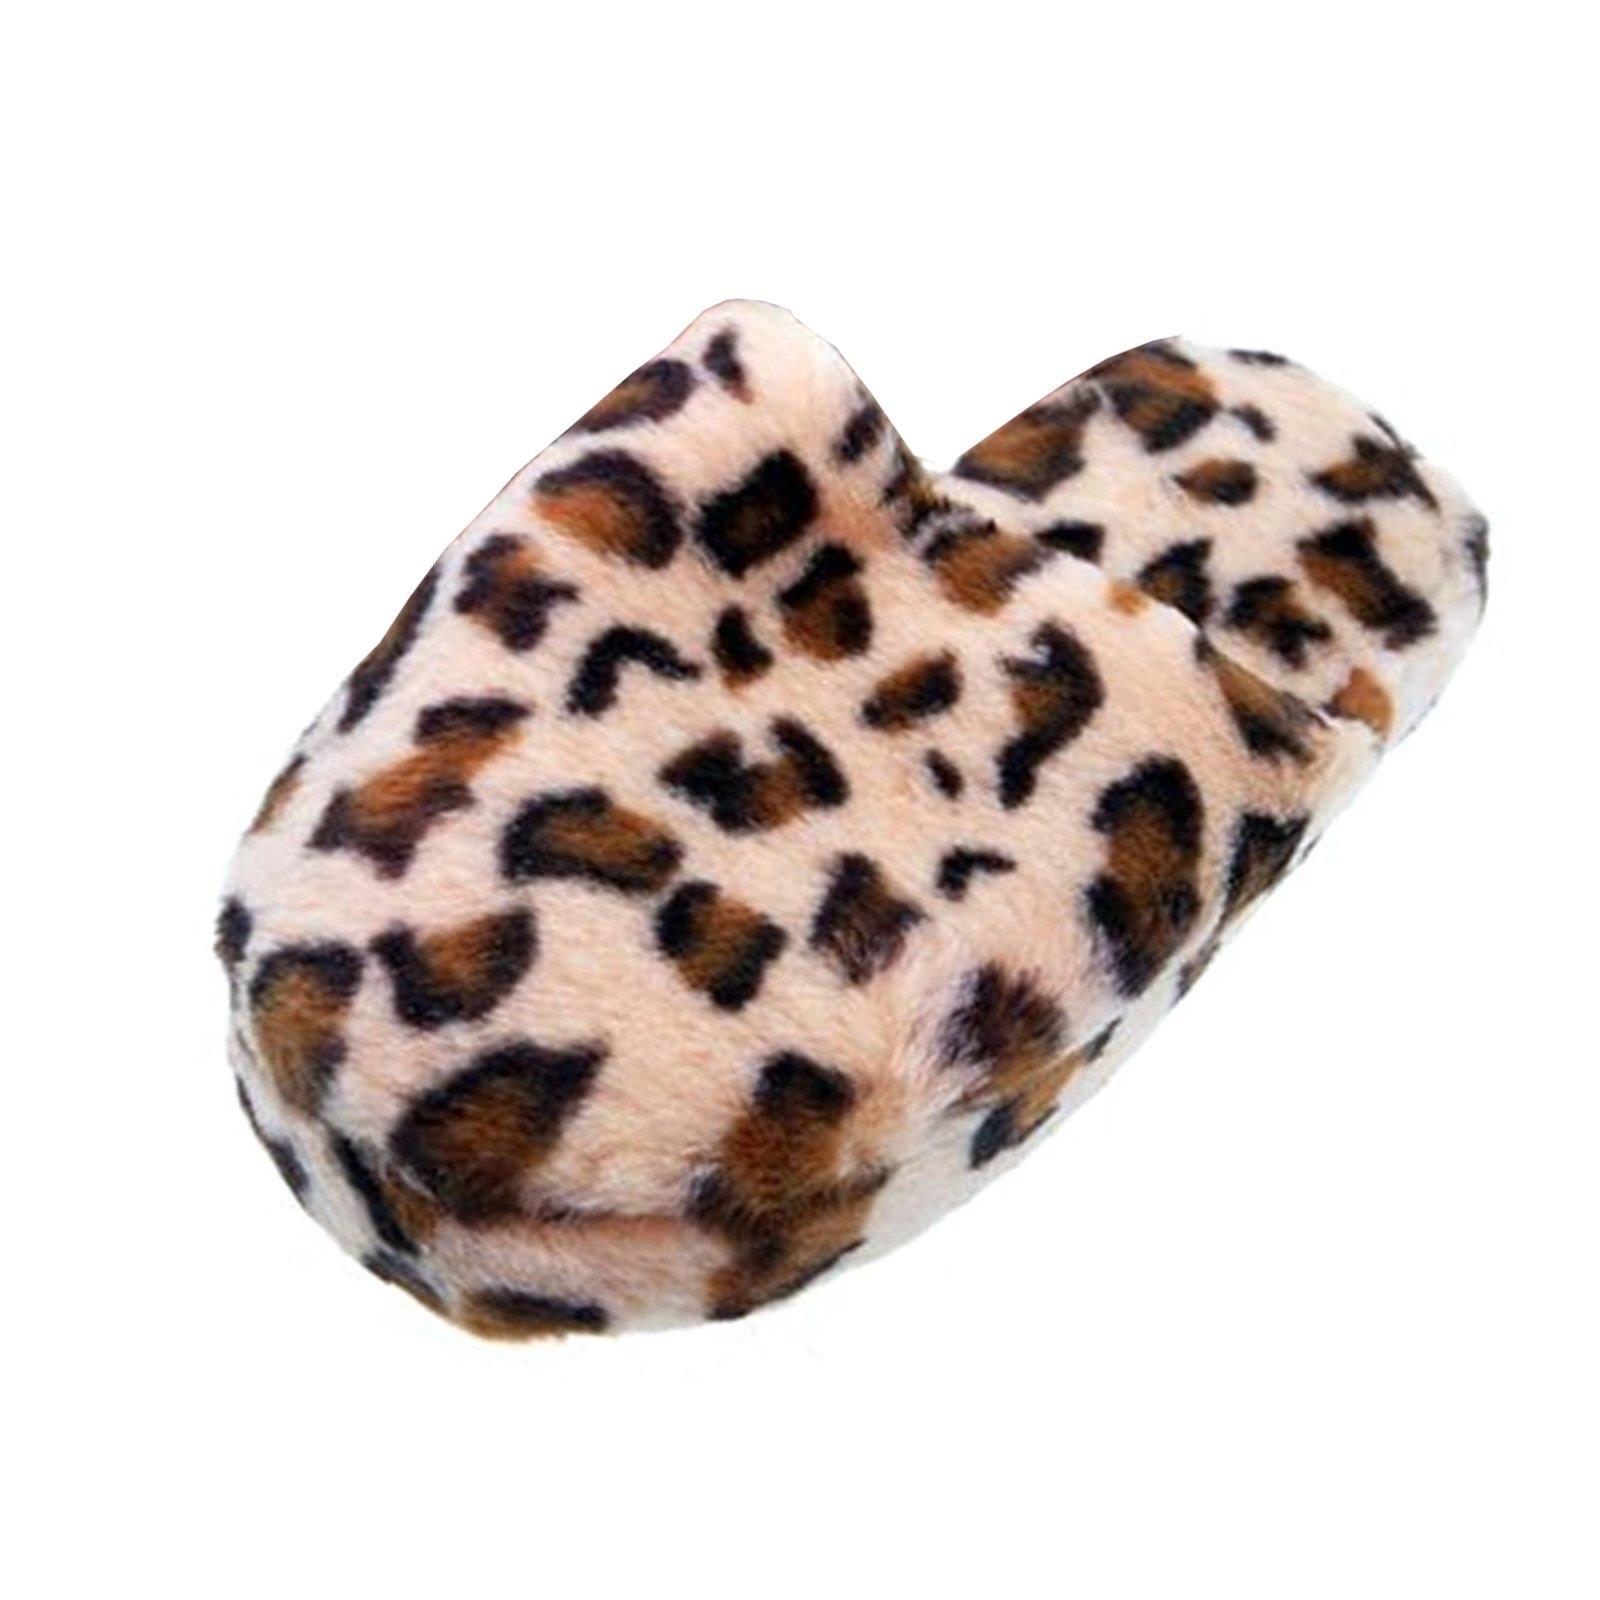 Leopard Tier Hausschuhe Pantoffel Schlappen Slipper Plüsch Damen Beige 36-41